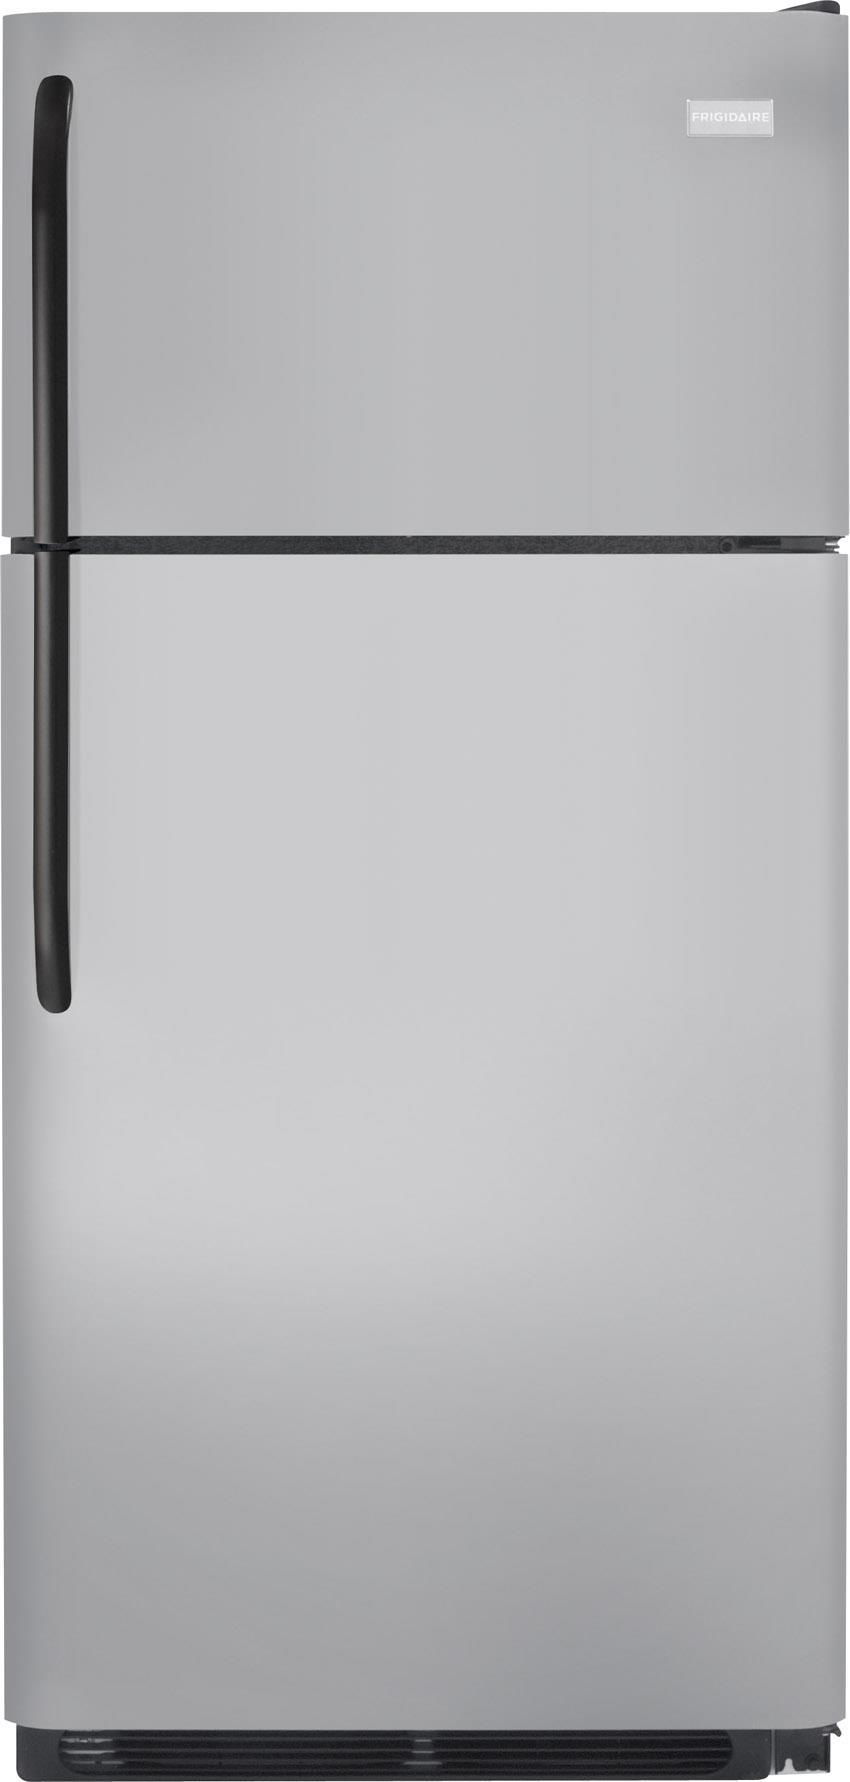 Frigidaire Top Freezer Refrigerators 18 Cu. Ft. Top Freezer Refrigerator - Item Number: FFTR1821QM